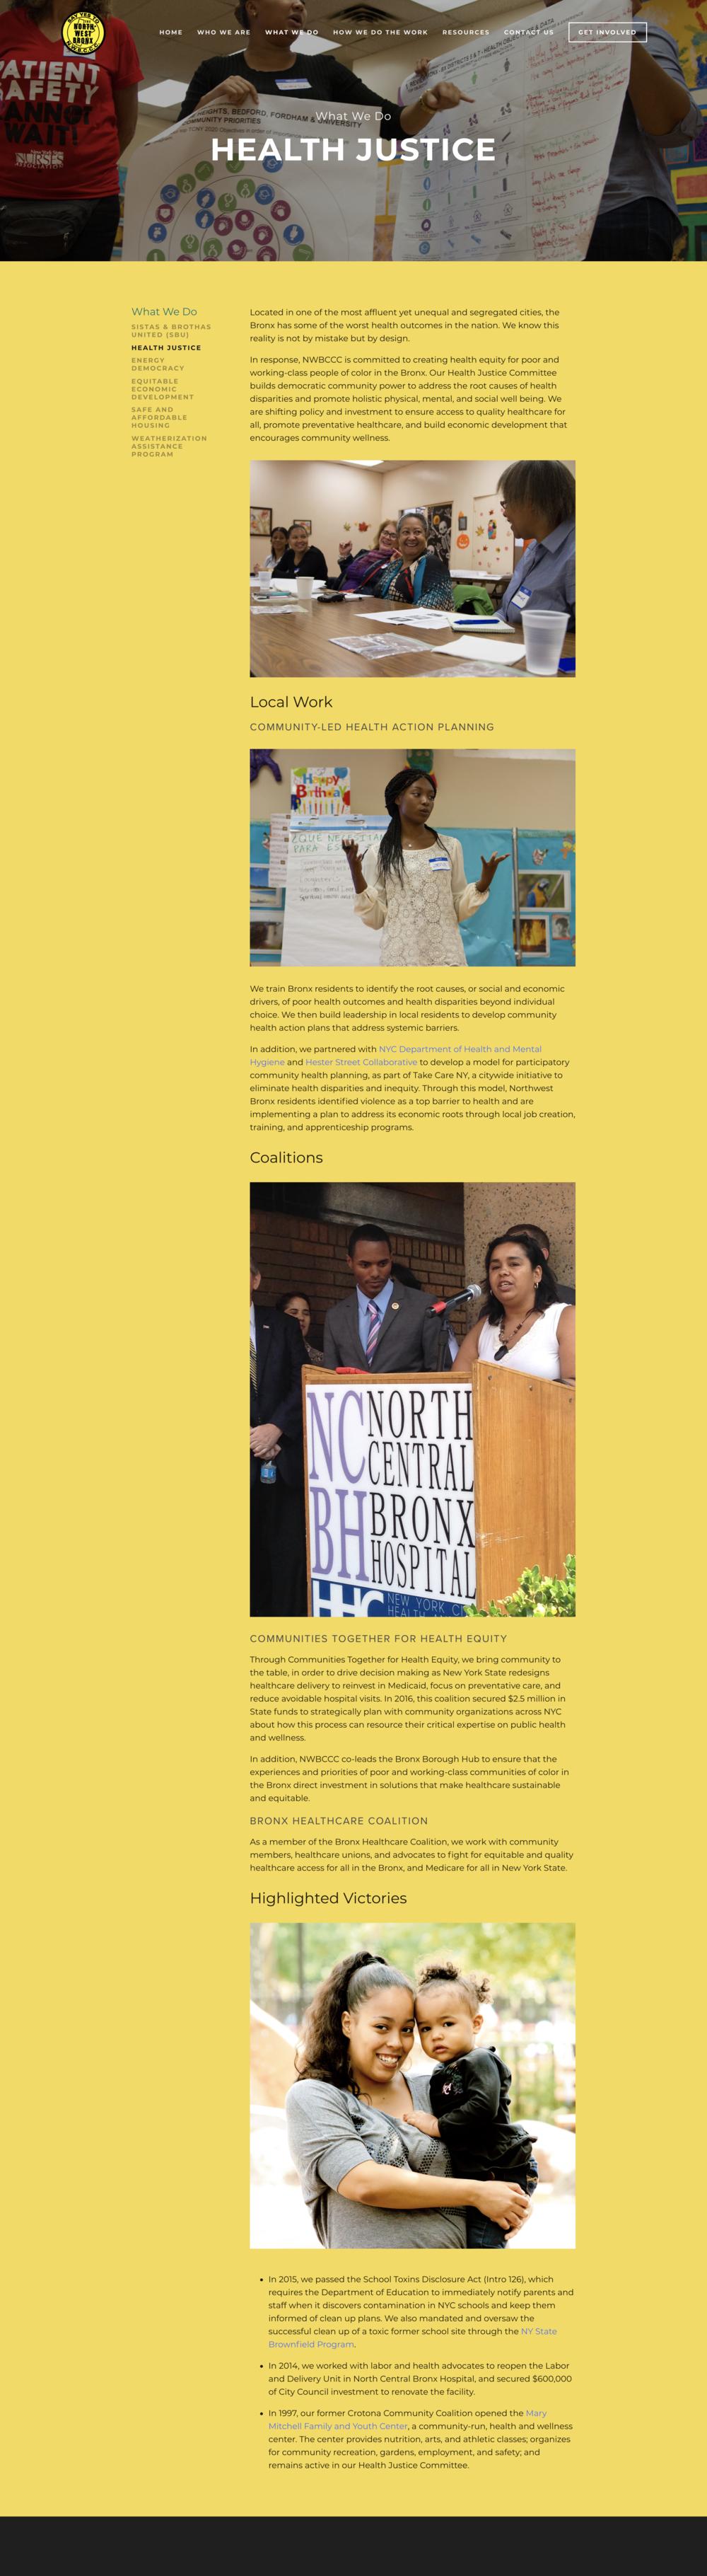 screencapture-northwestbronx-org-health-justice-2018-09-10-14_35_06.png